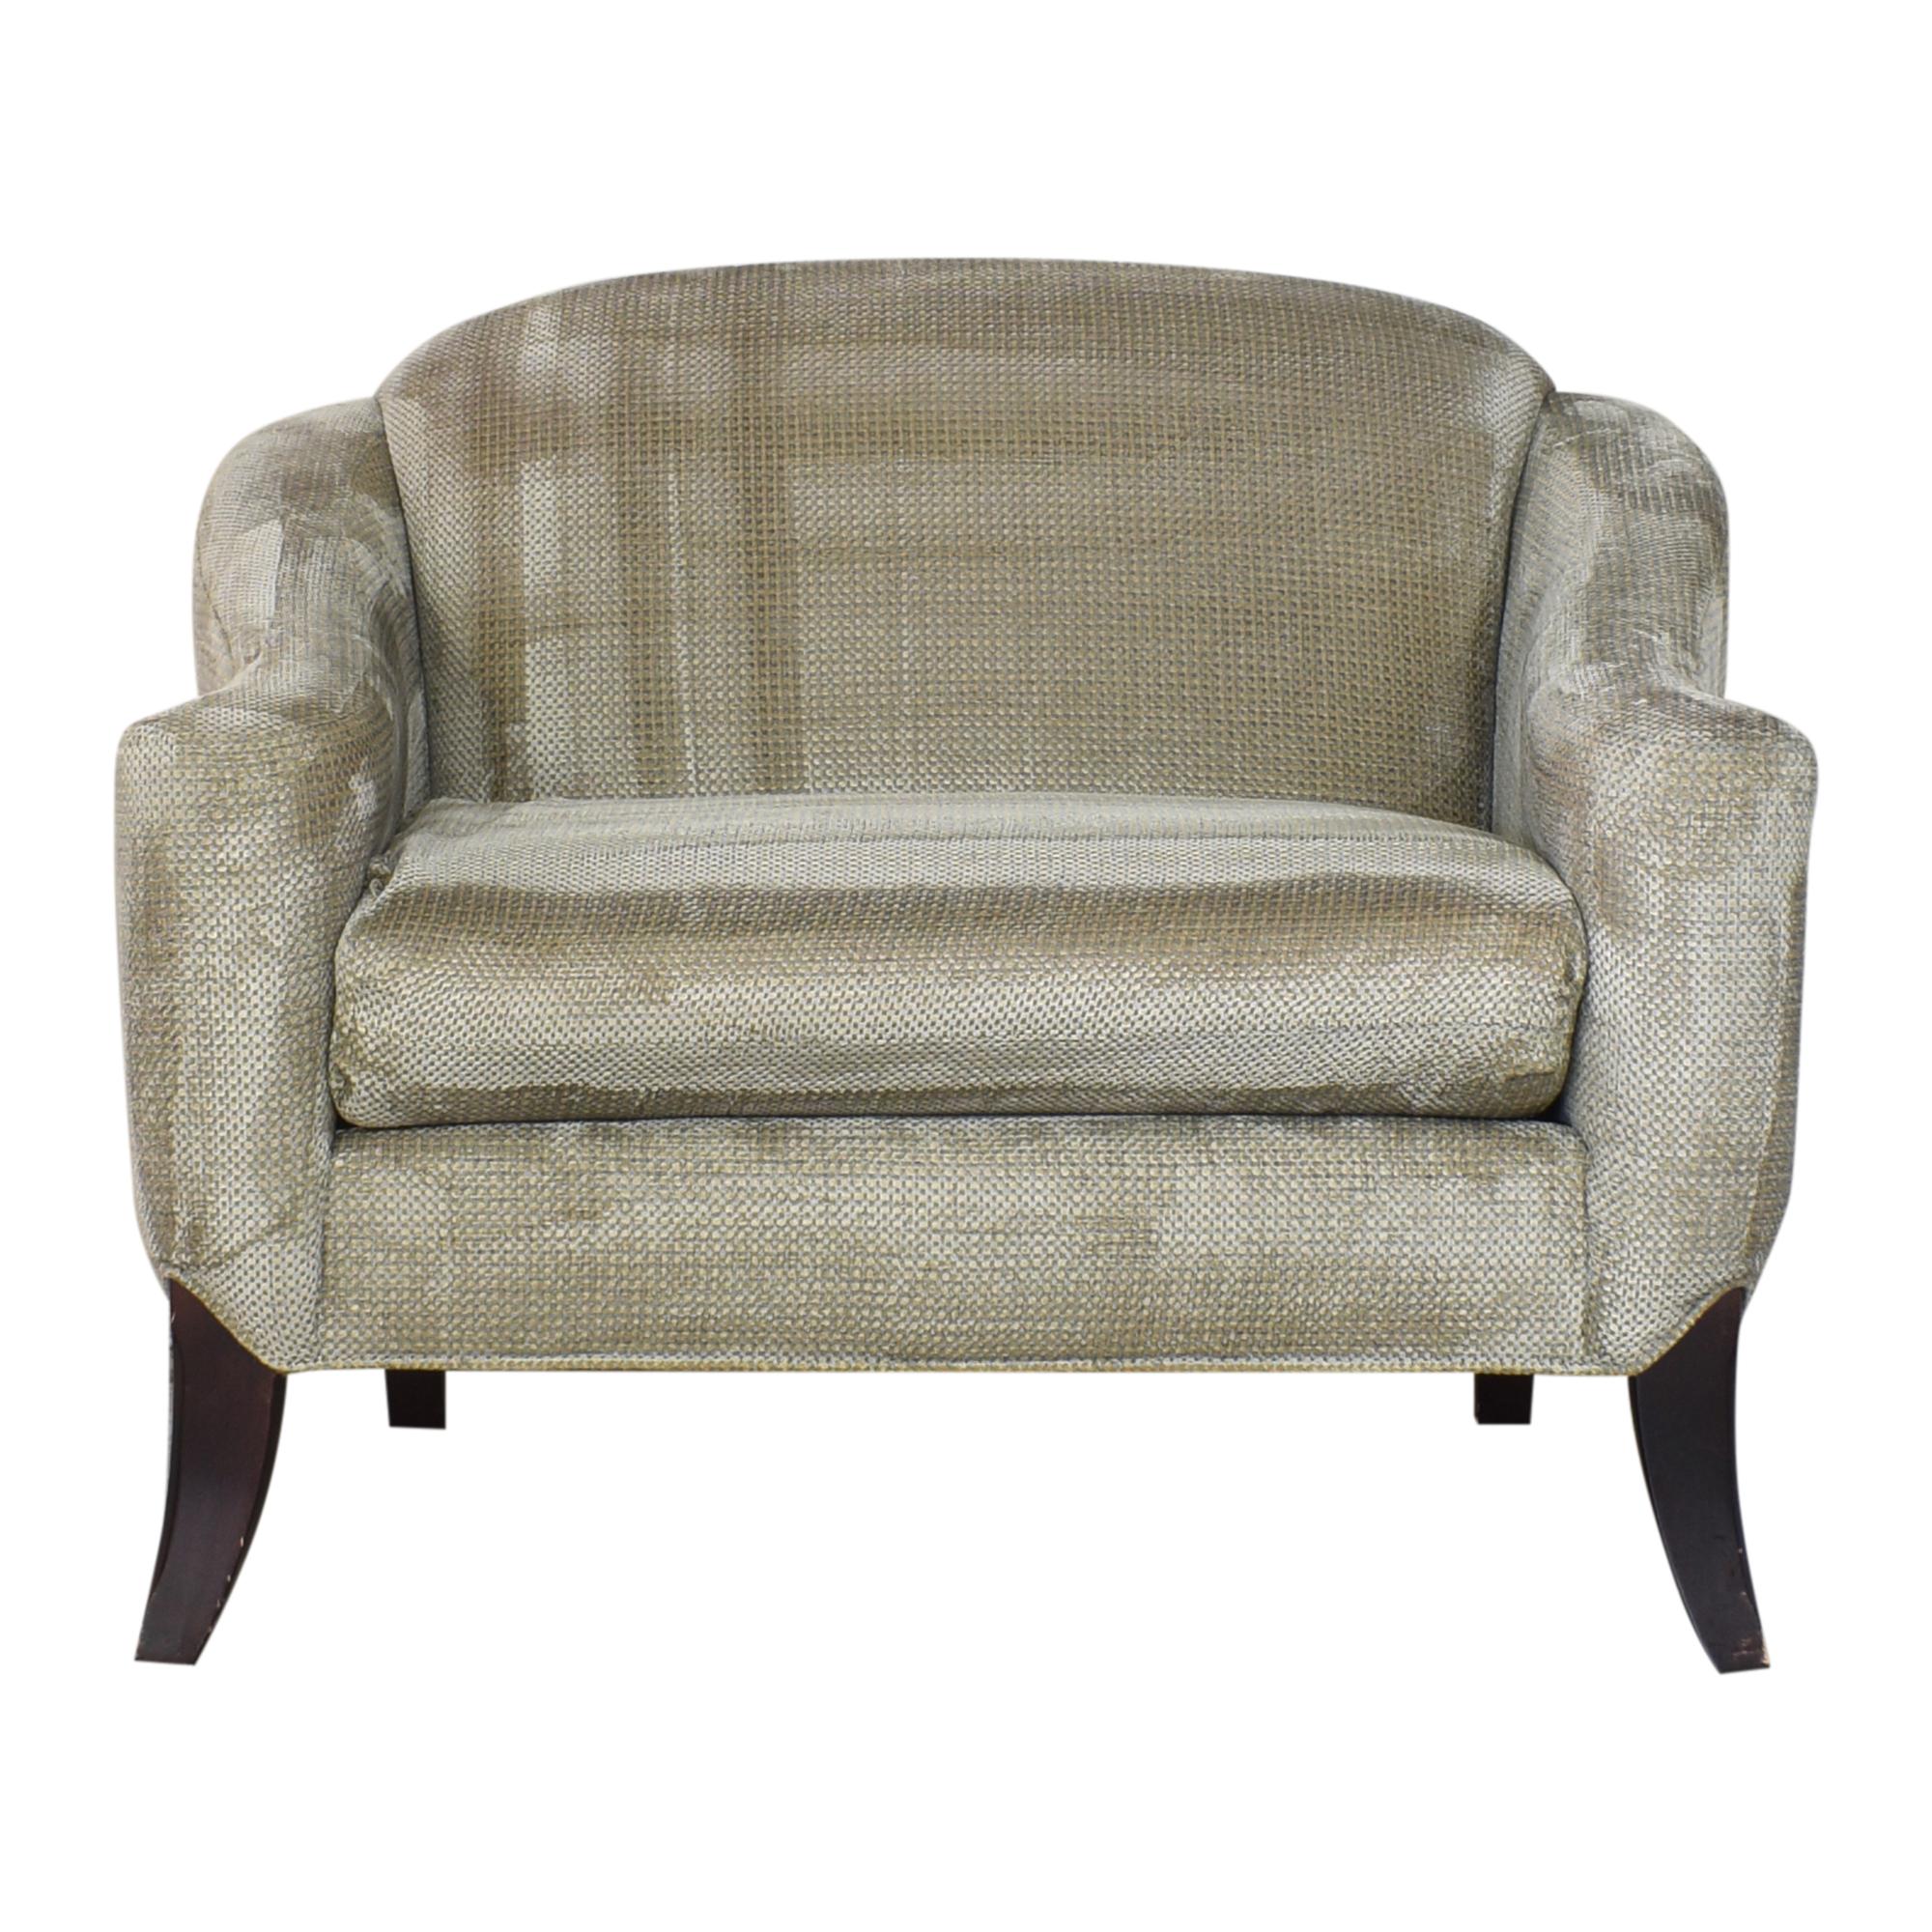 Kravet Kravet Transitional Chair and a Half pa